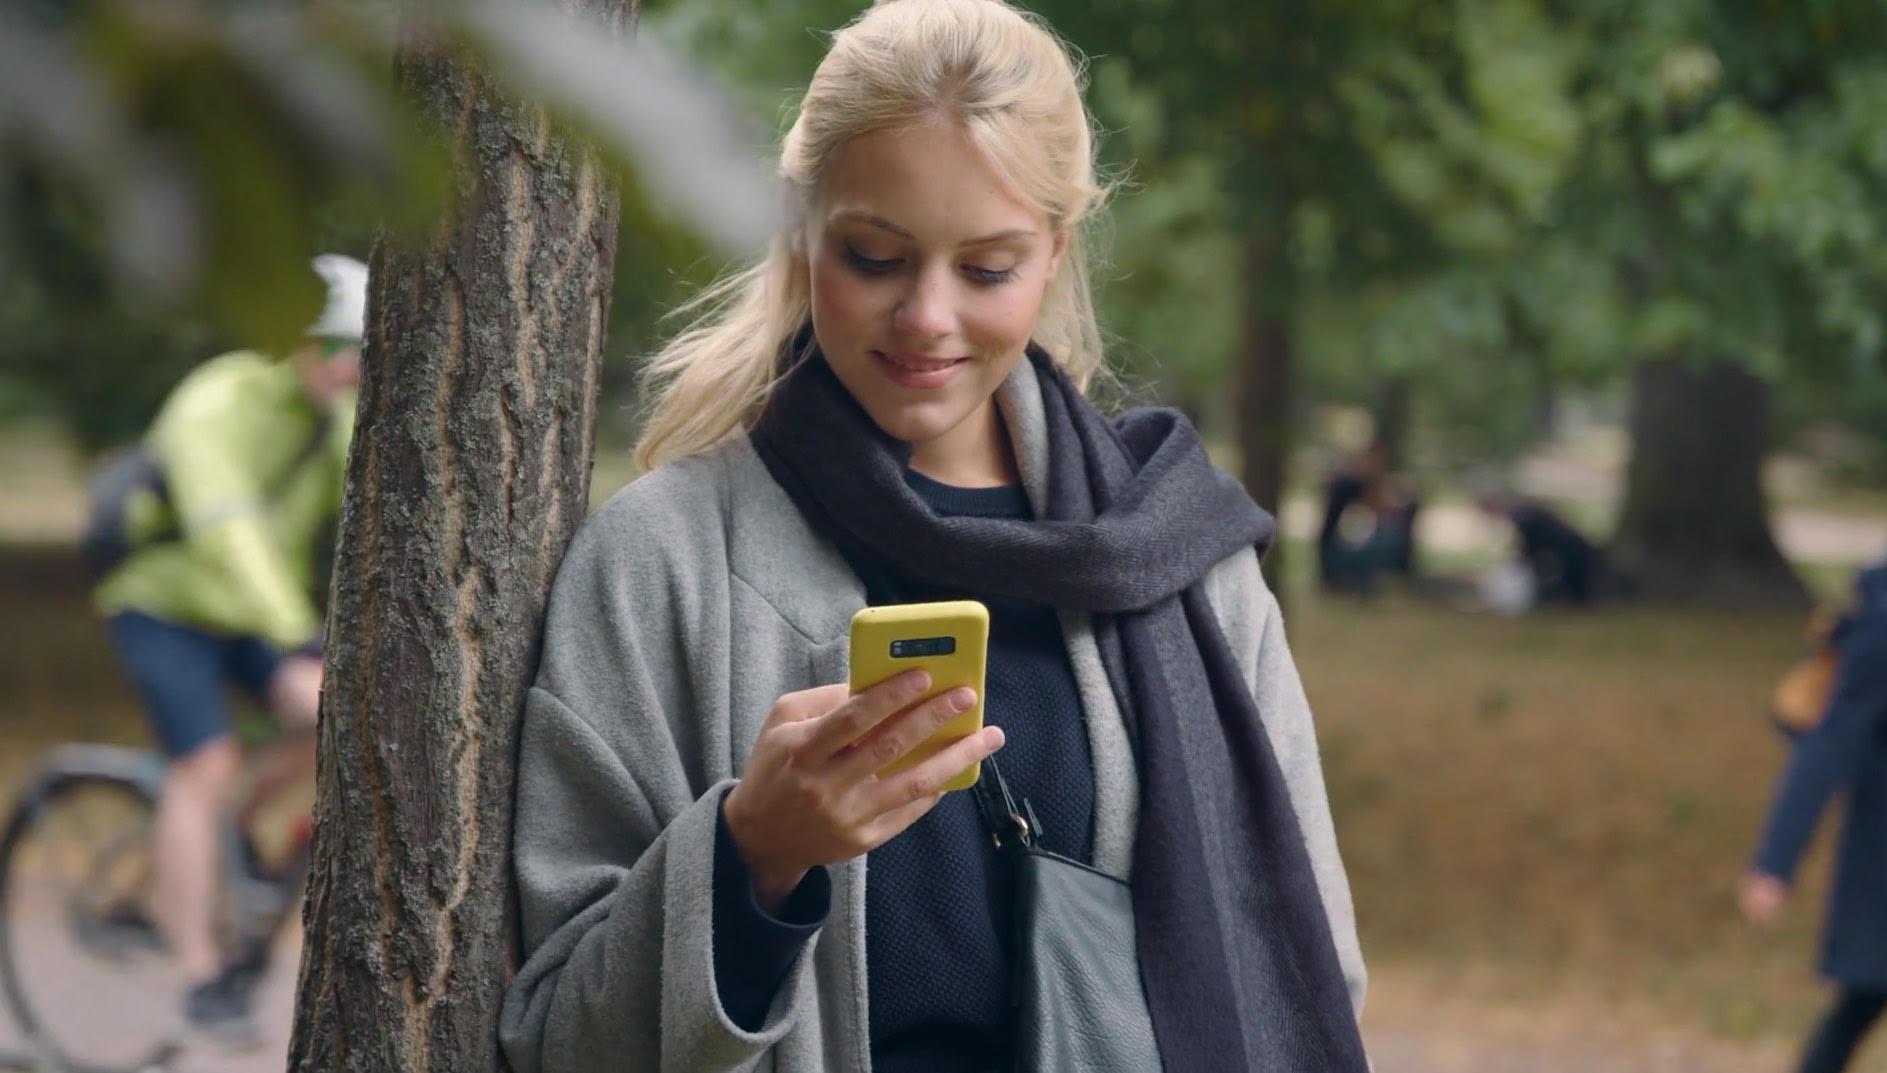 commerzbank mobile app imagefilm